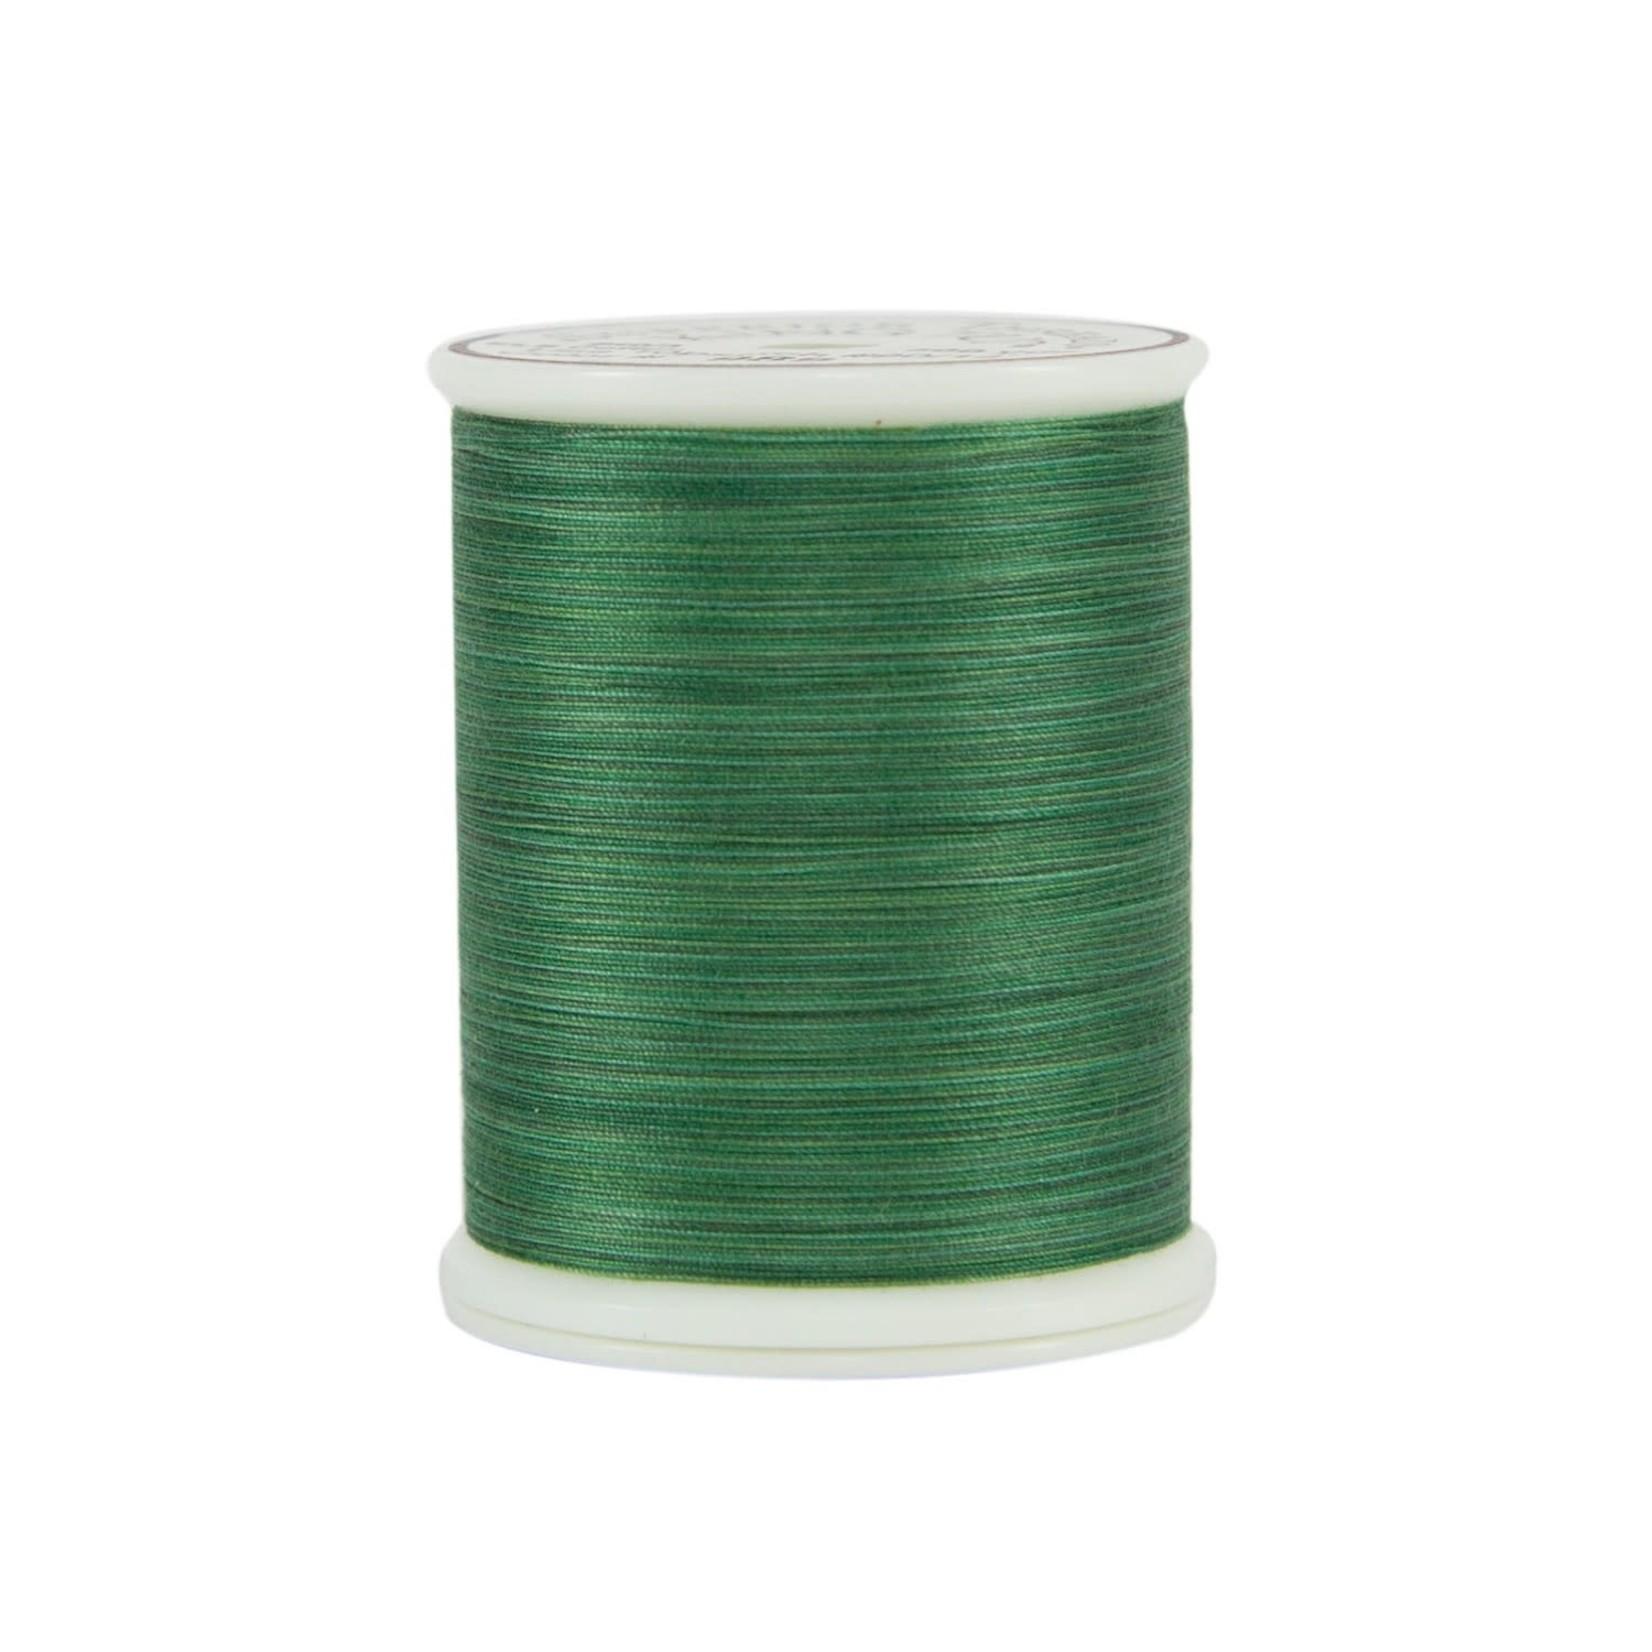 Superior Threads King Tut - #40 - 457 m - 0989 Malachite